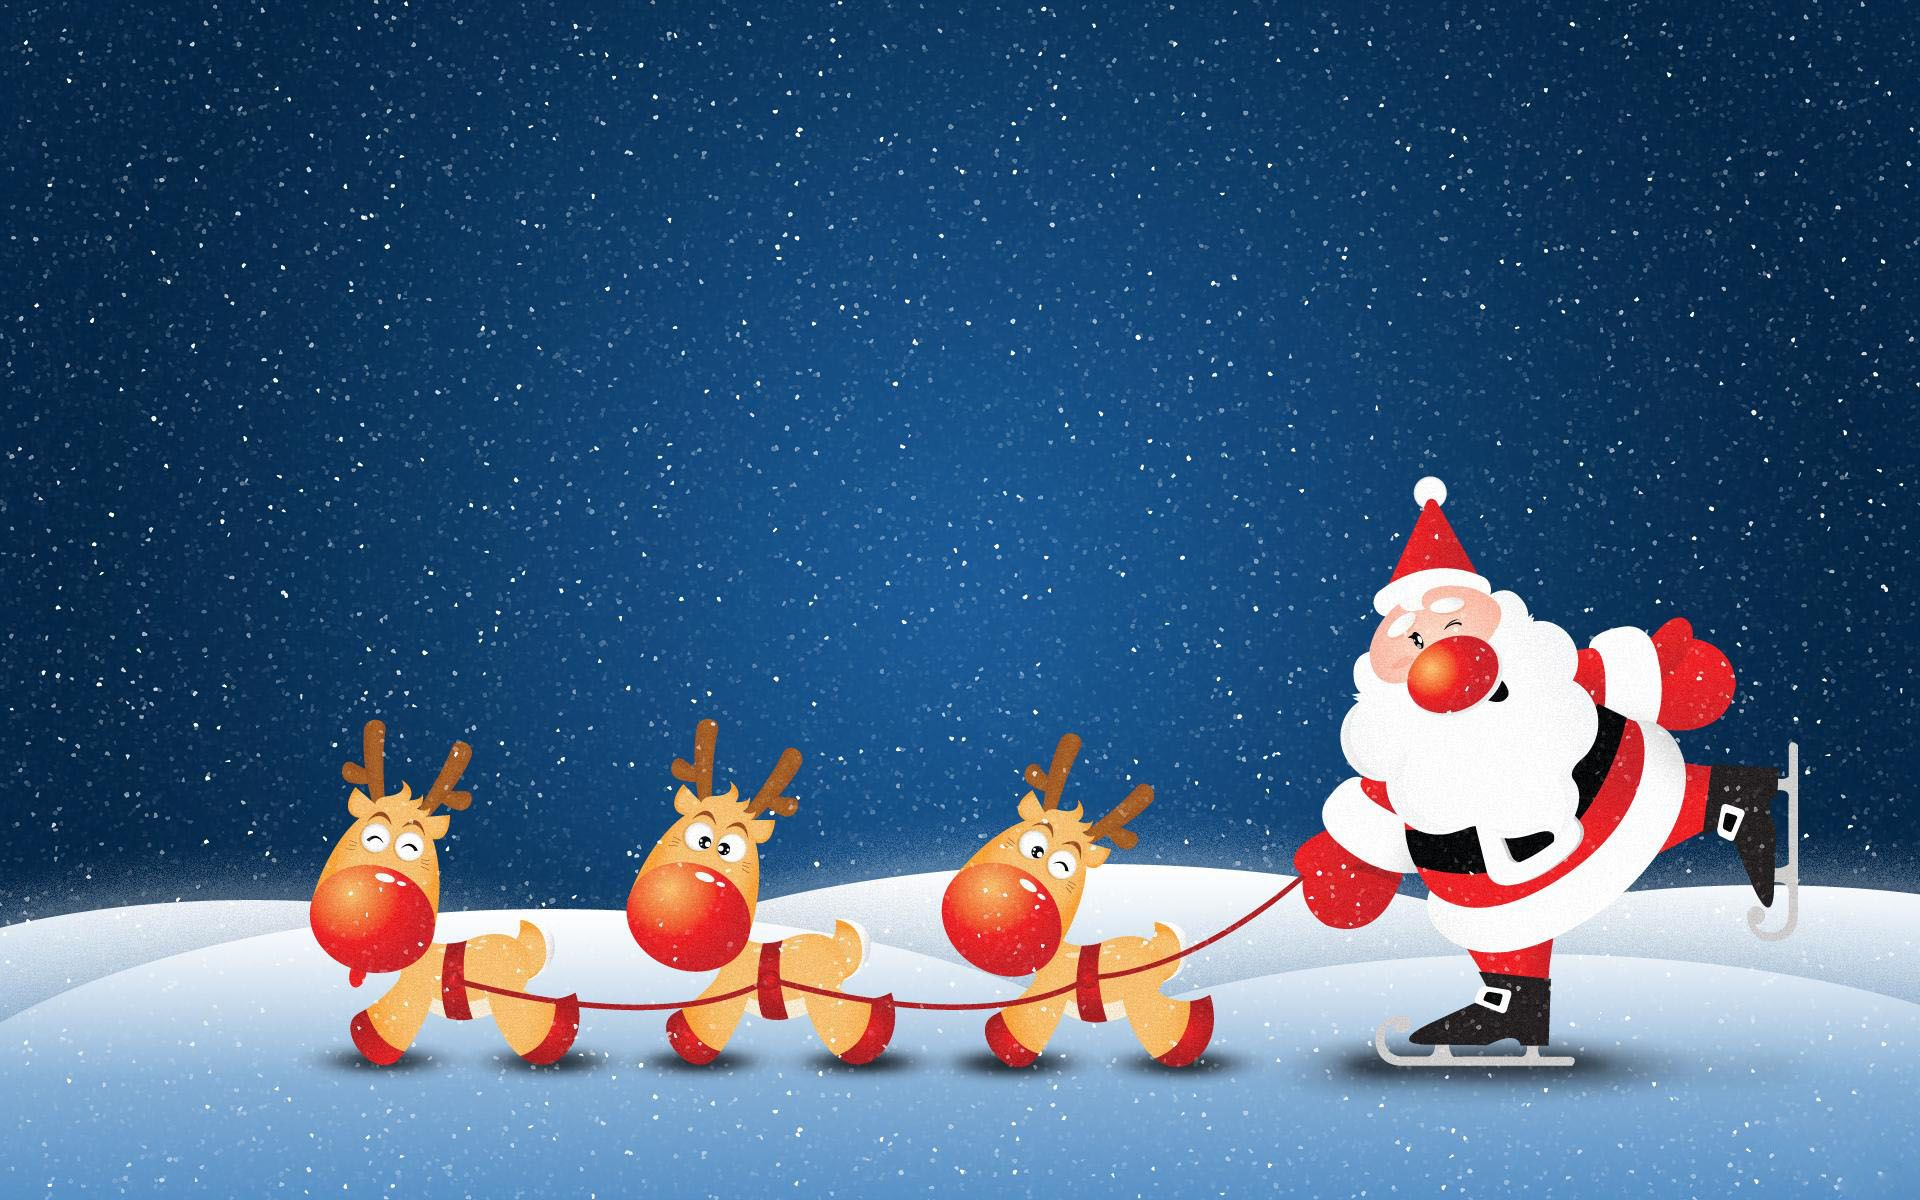 Cute Christmas Santa Wallpaper Christmas Desktop Wallpaper Christmas Cartoons Merry Christmas Wishes Images